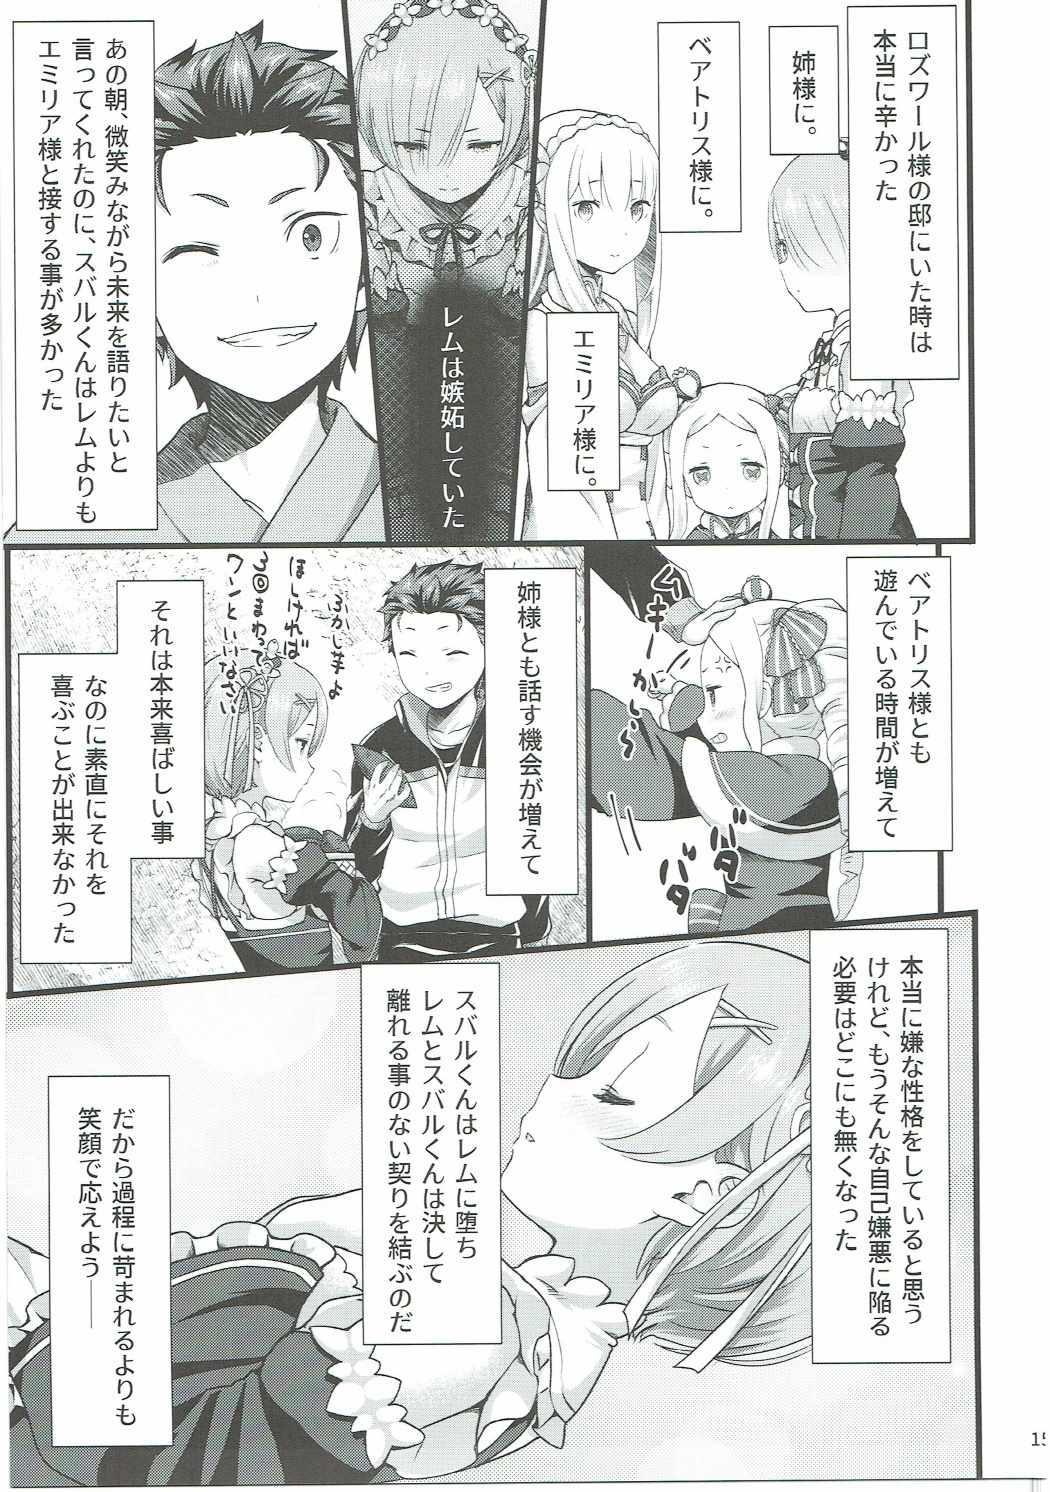 Oni no Shoujo 13